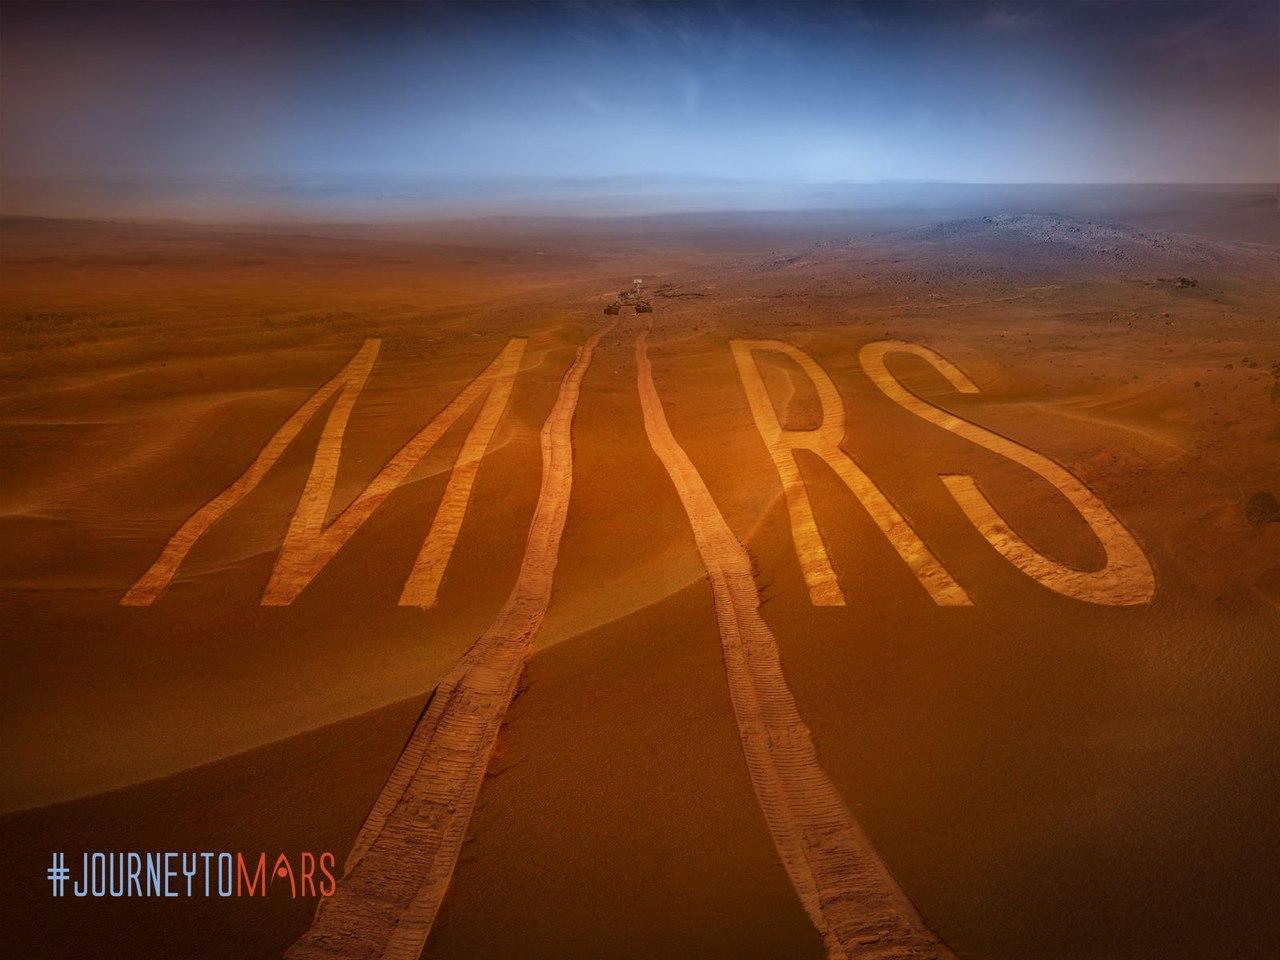 У НАСА нет денег на высадку людей на Марсе